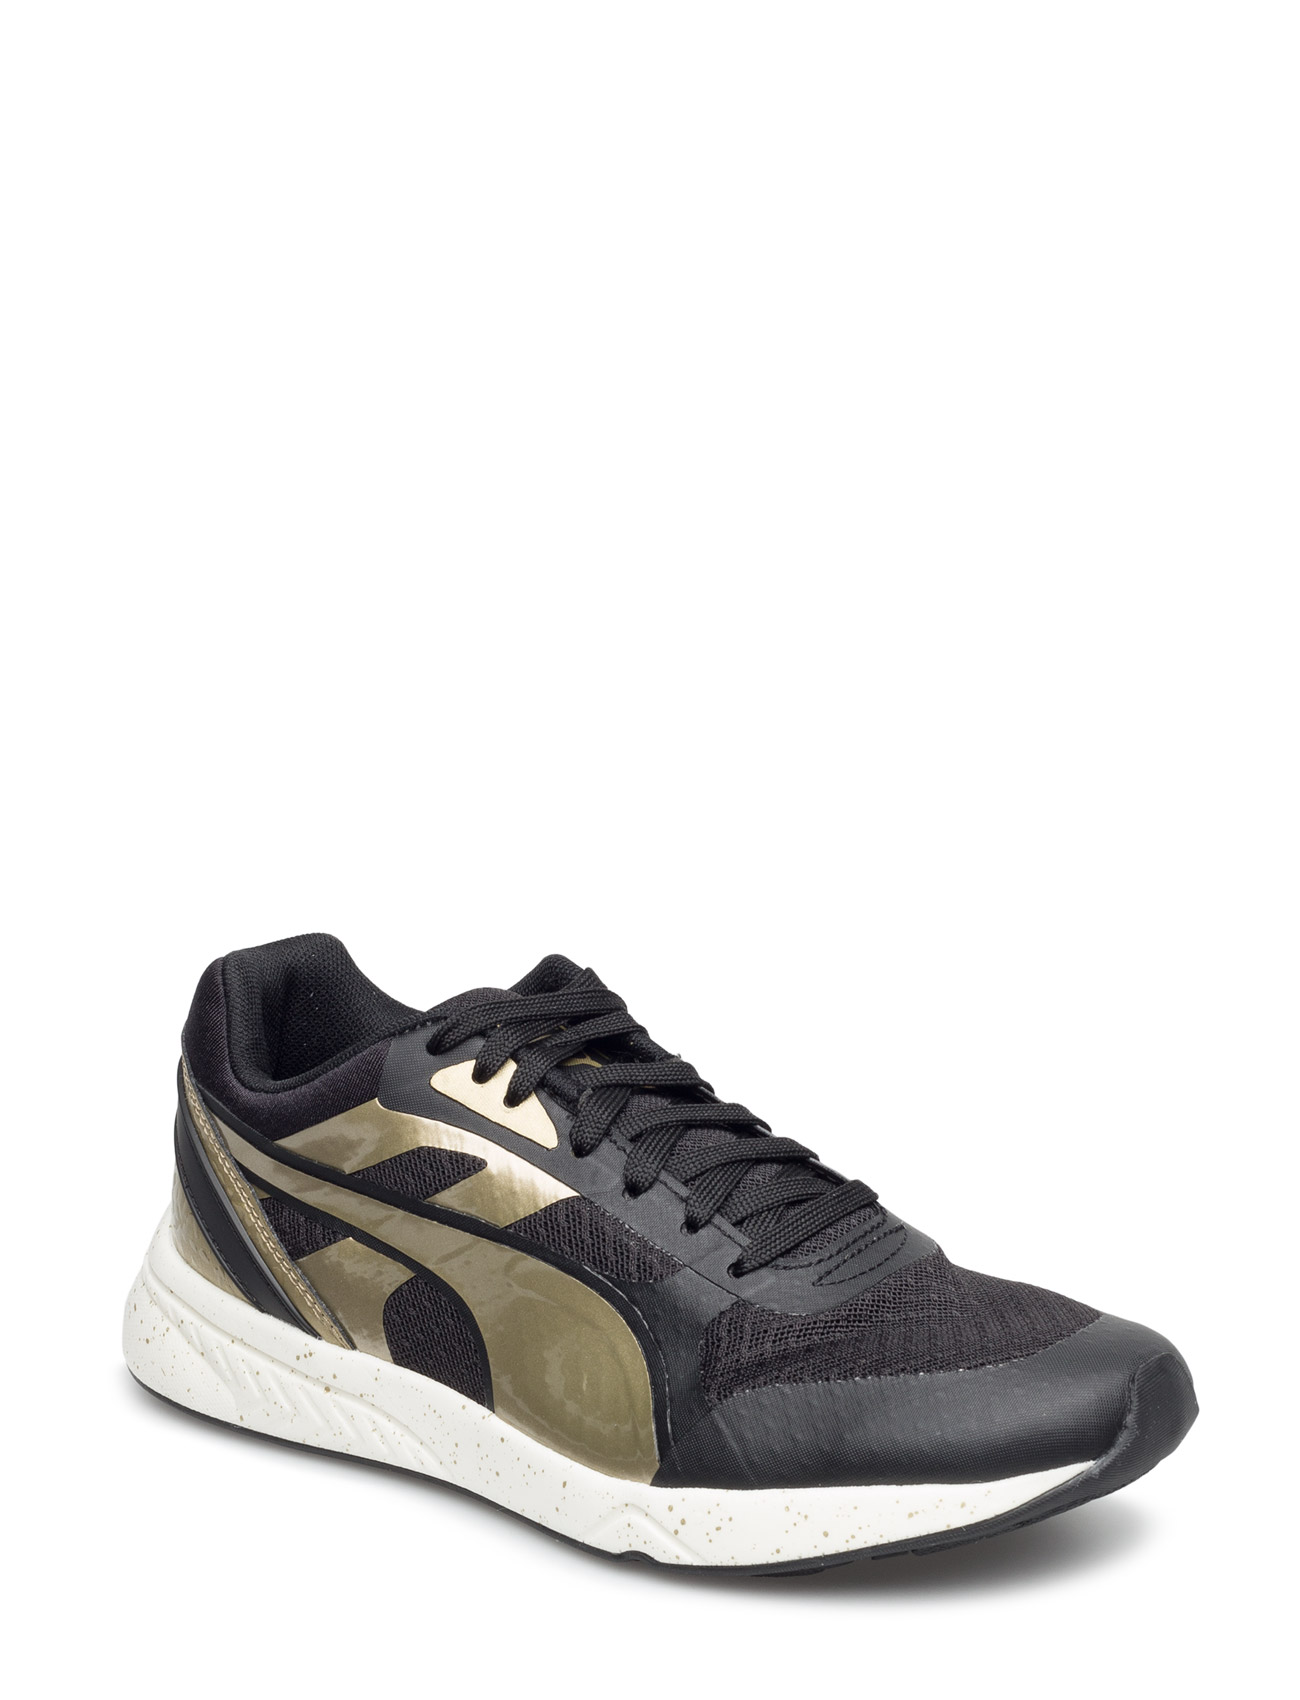 698 Ignite Metallic Wn'S Puma Sneakers til Damer i Sort